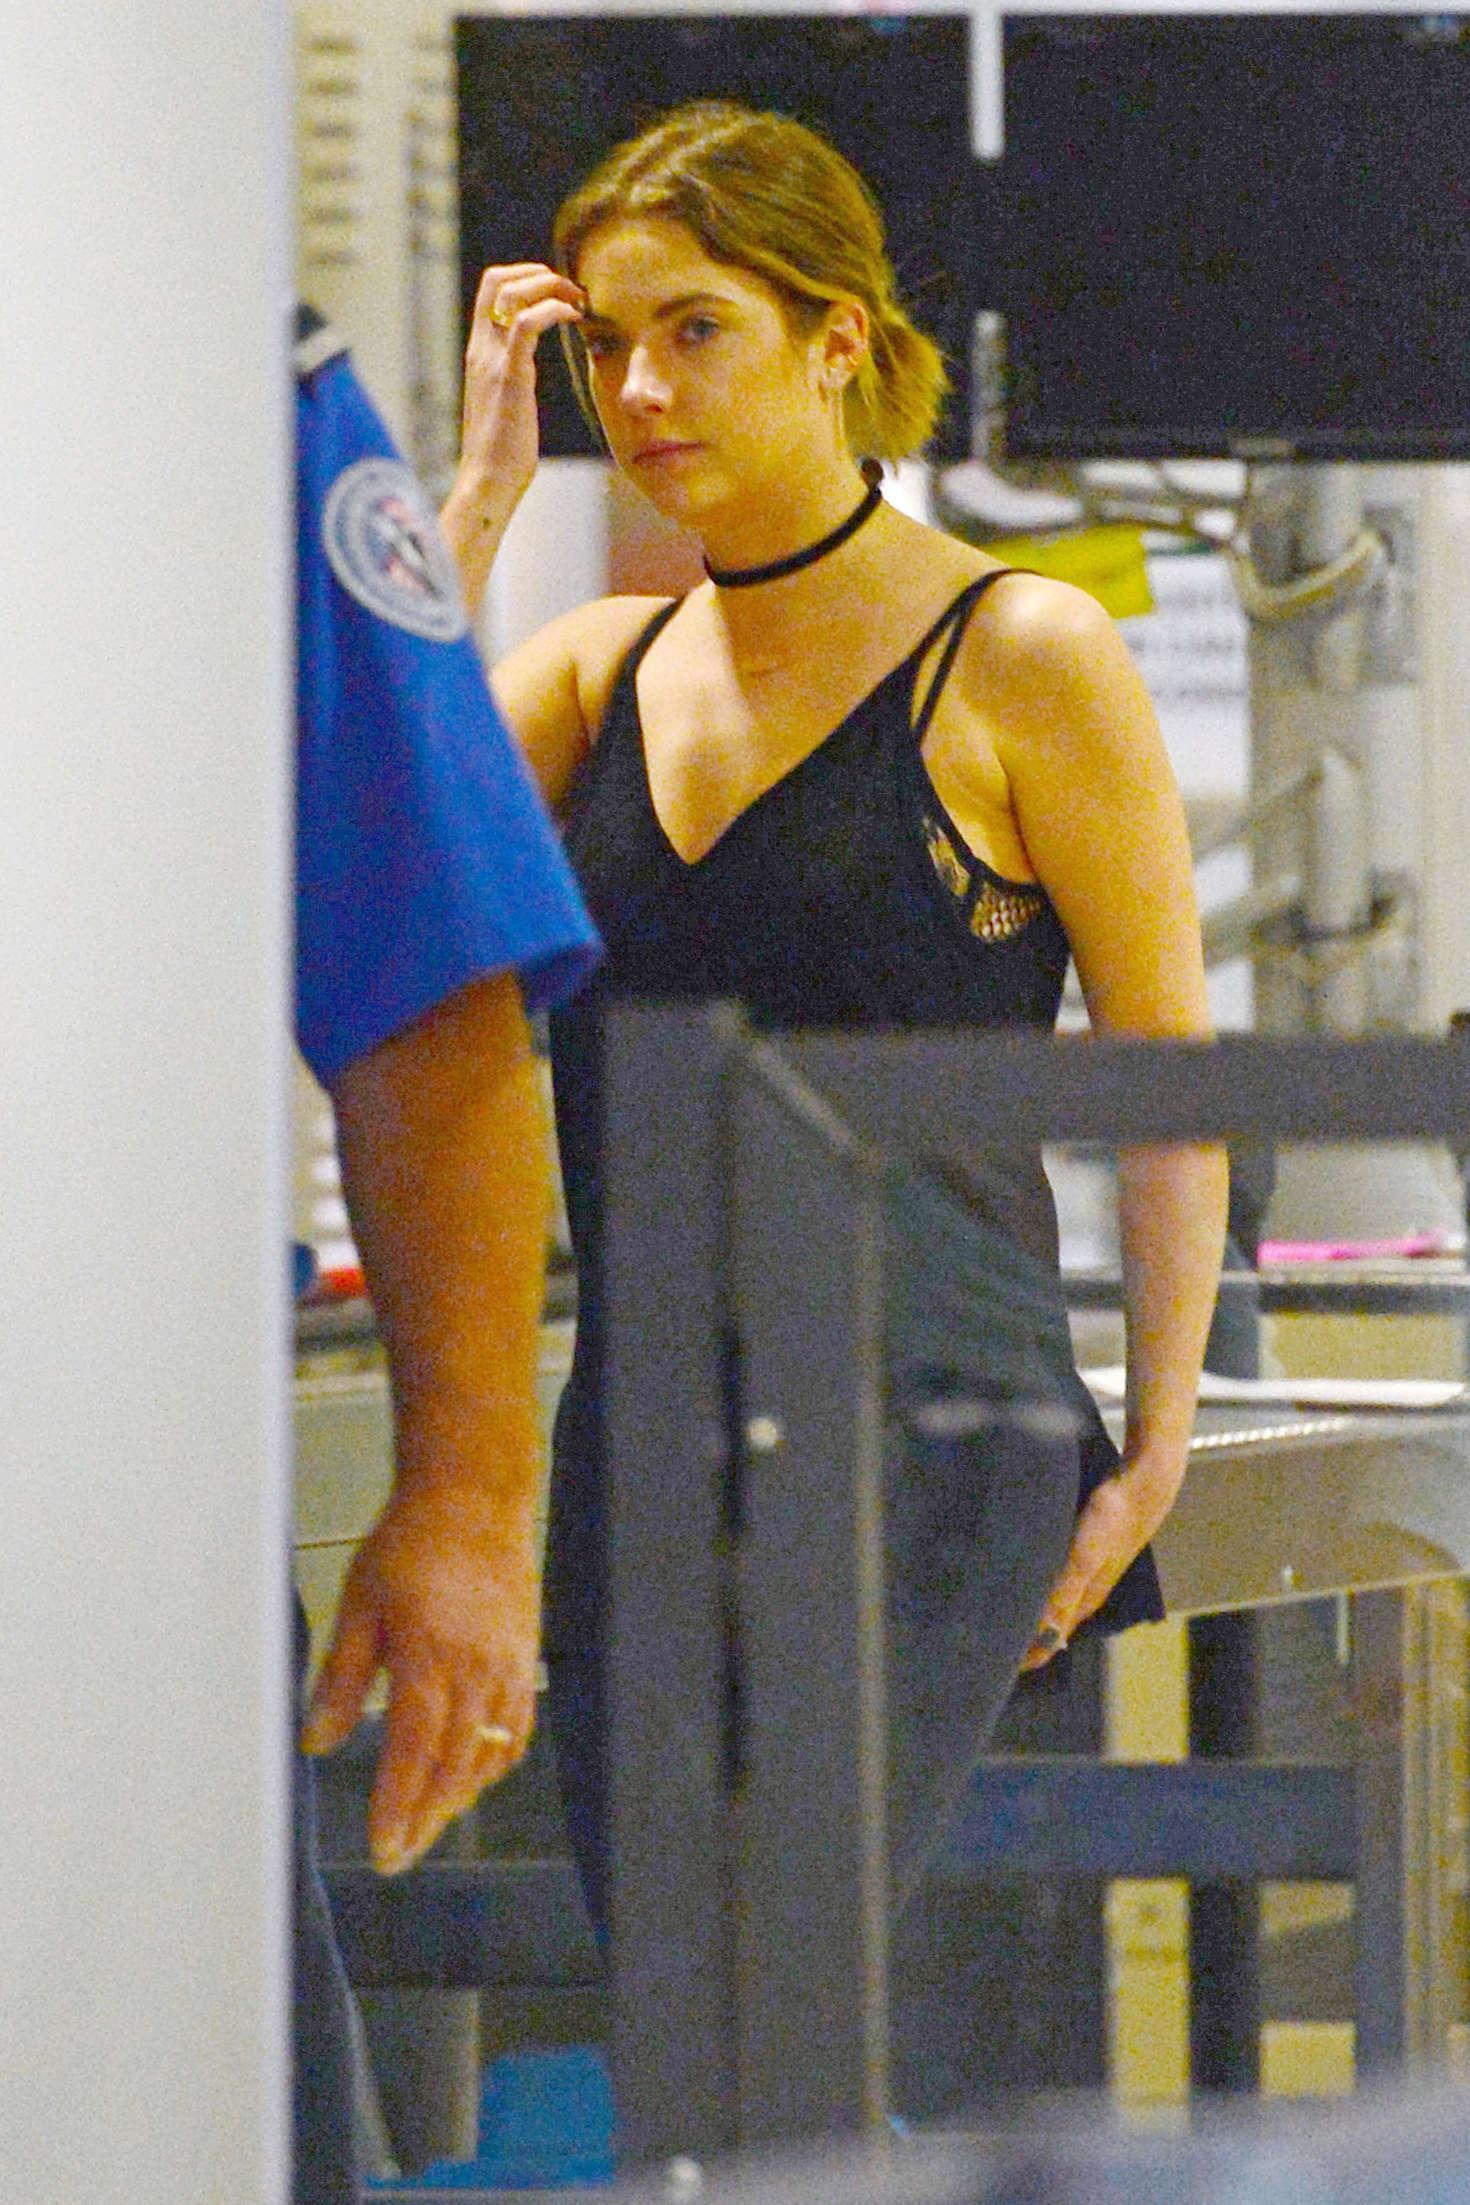 Ashley Benson at the Airport in Miami